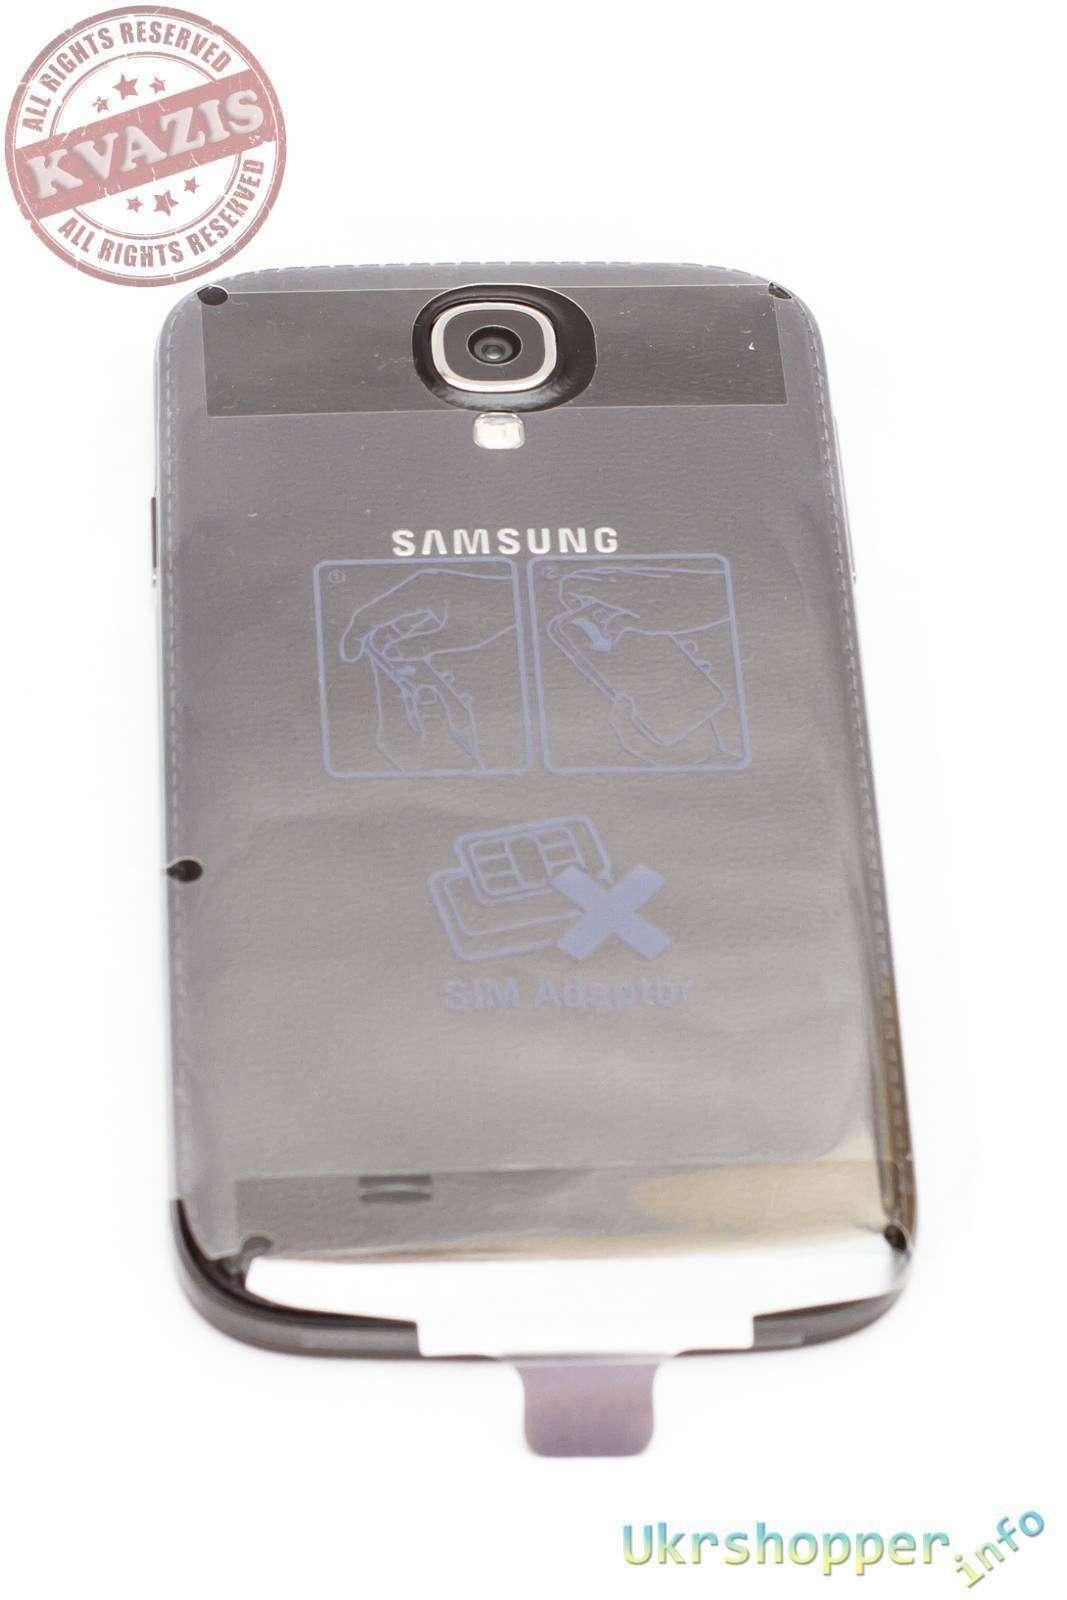 Сокол: Полный обзор  Samsung Galaxy S4 i9500